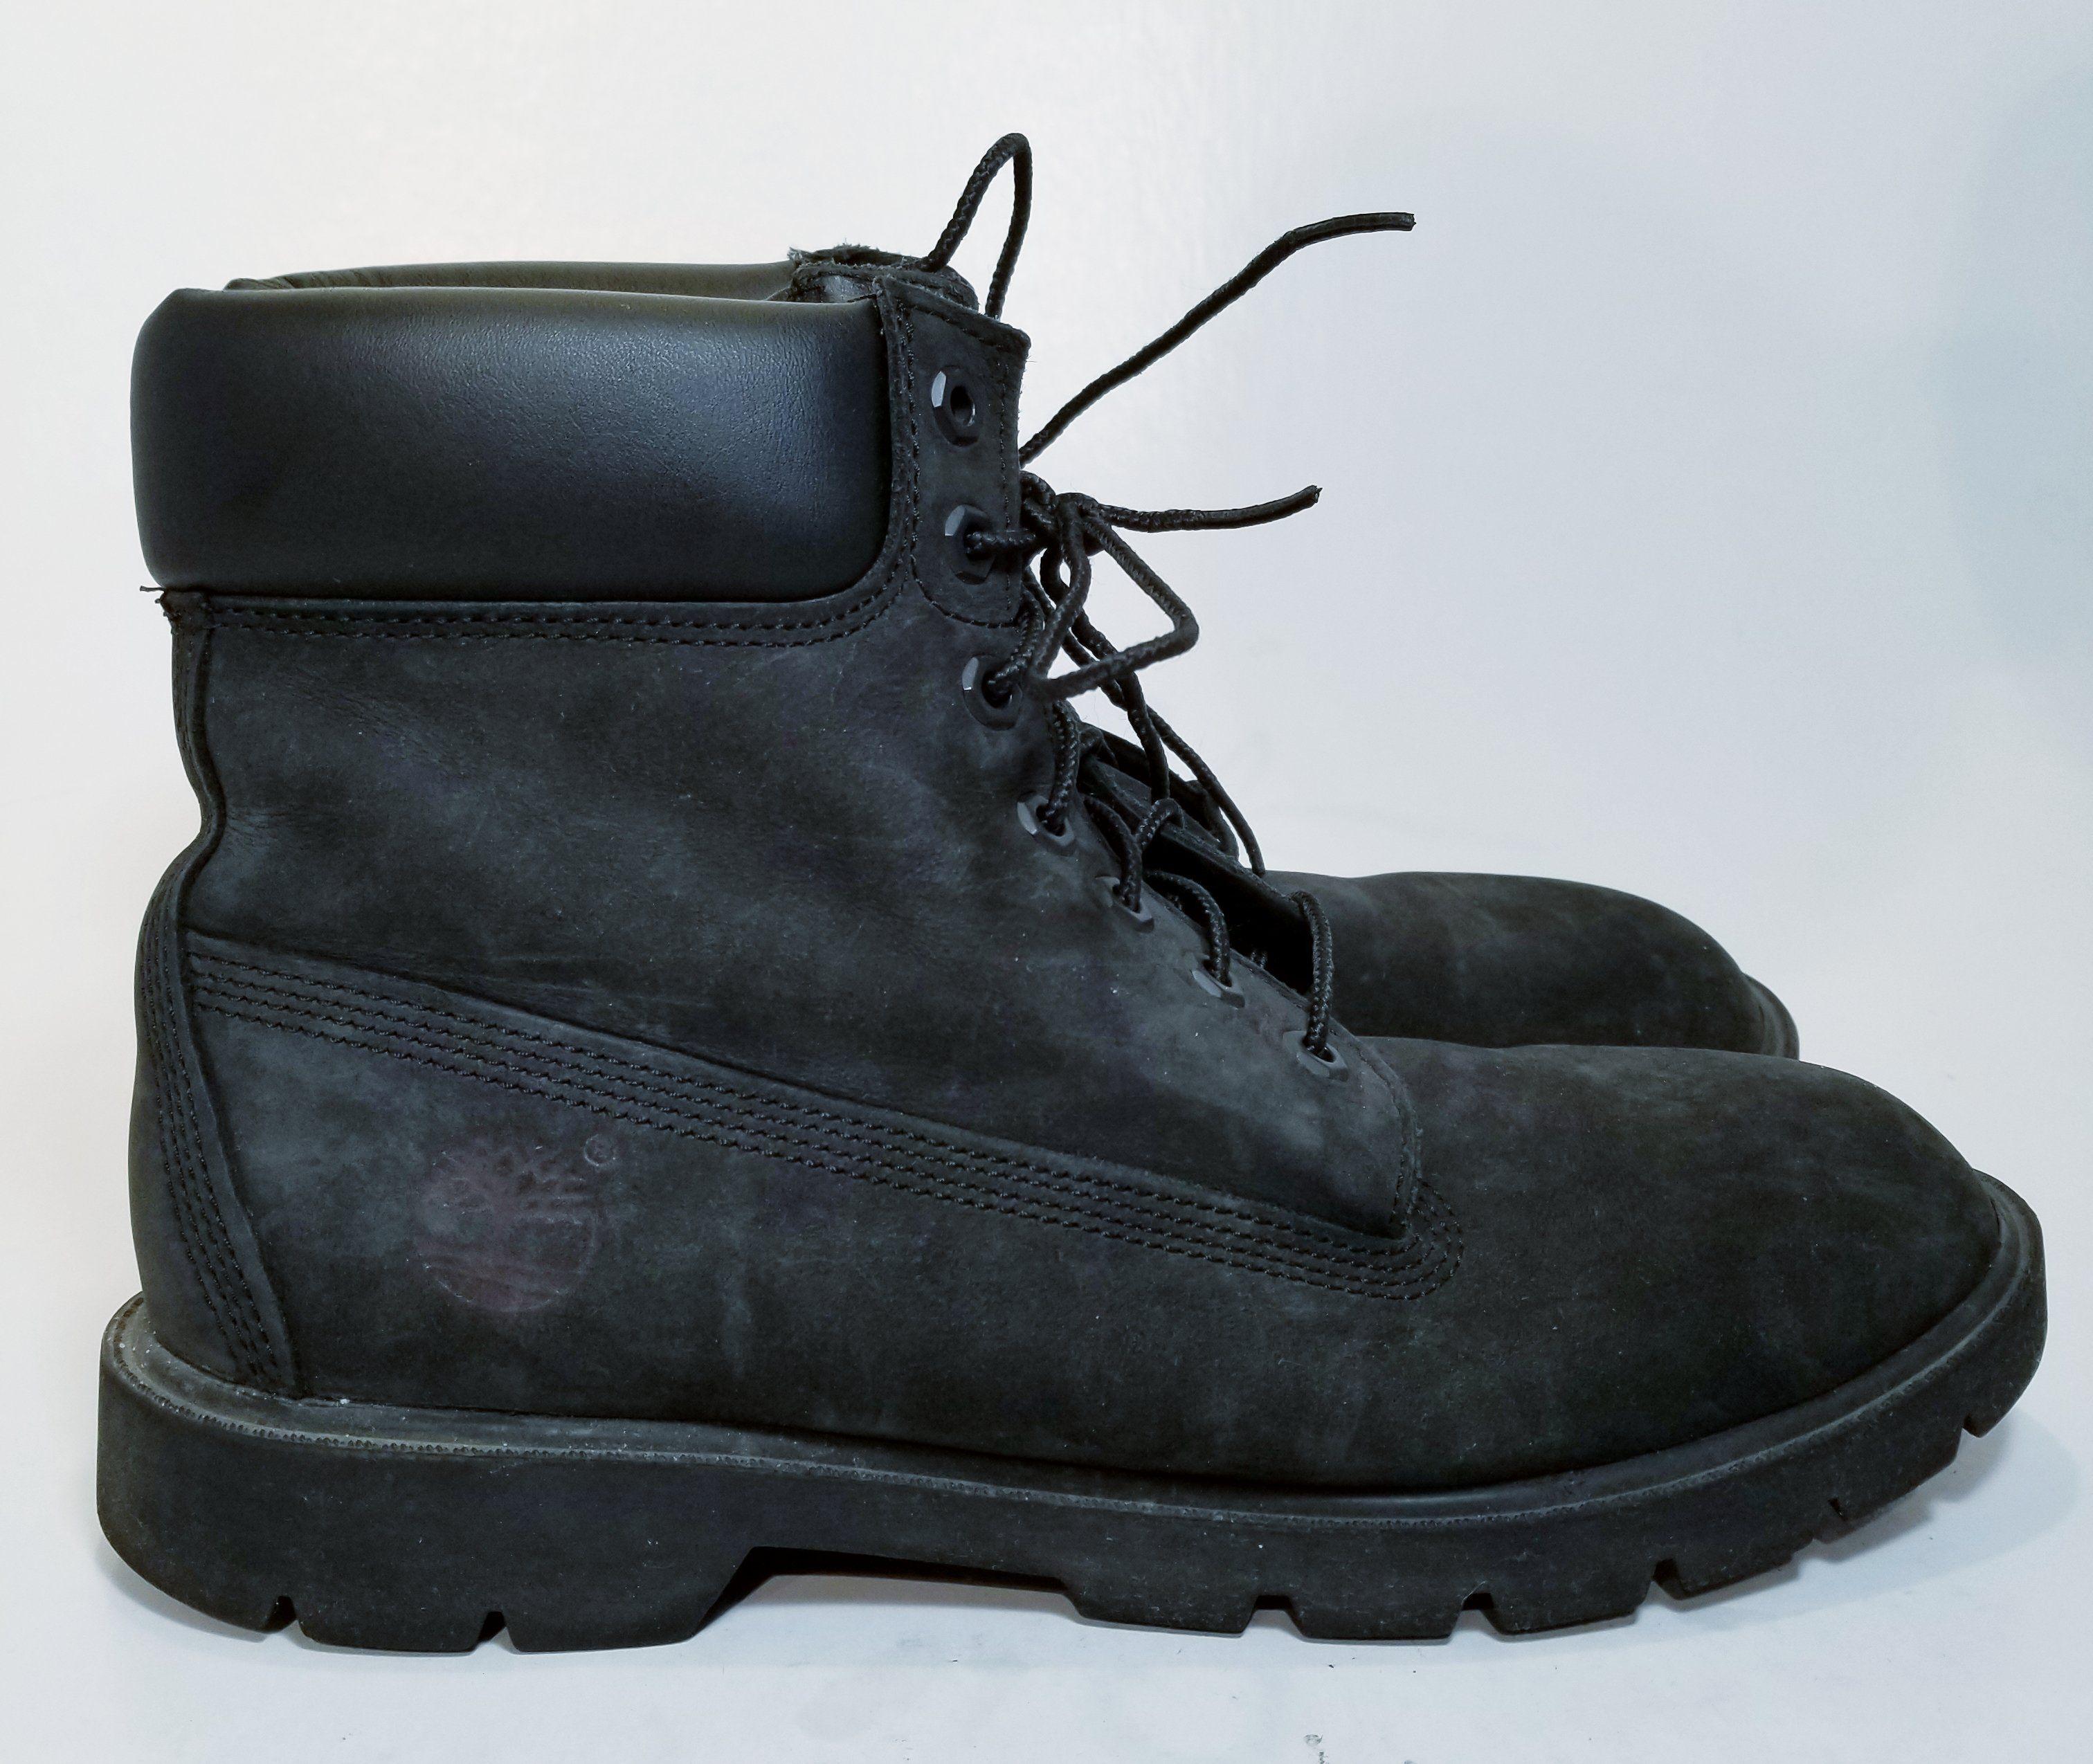 Men's Genuine Leather Snow Boots Black Size 9.5